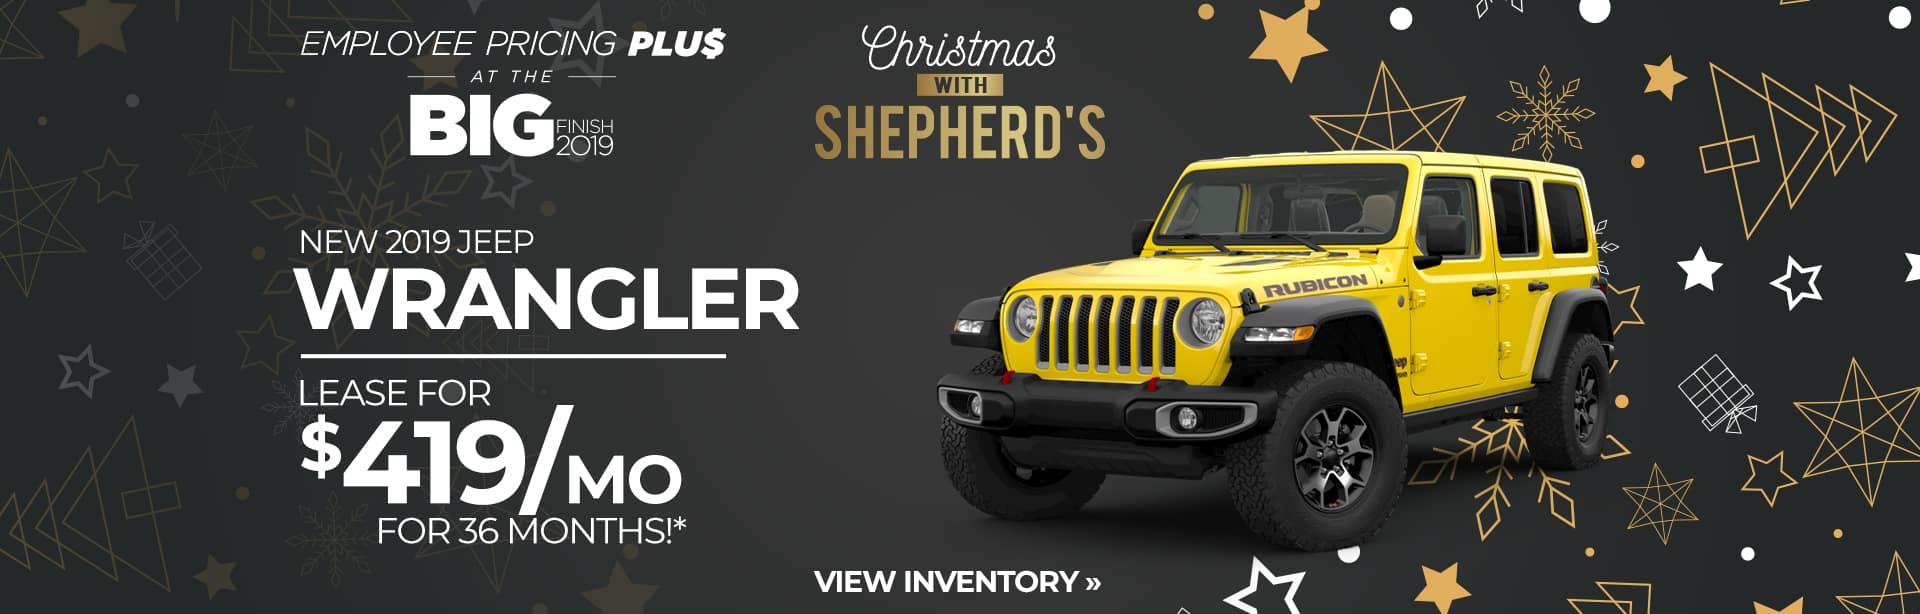 Jeep Incentives 2017 >> Shepherd S Chrysler Dodge Jeep Ram Cdjr Dealer In Auburn In